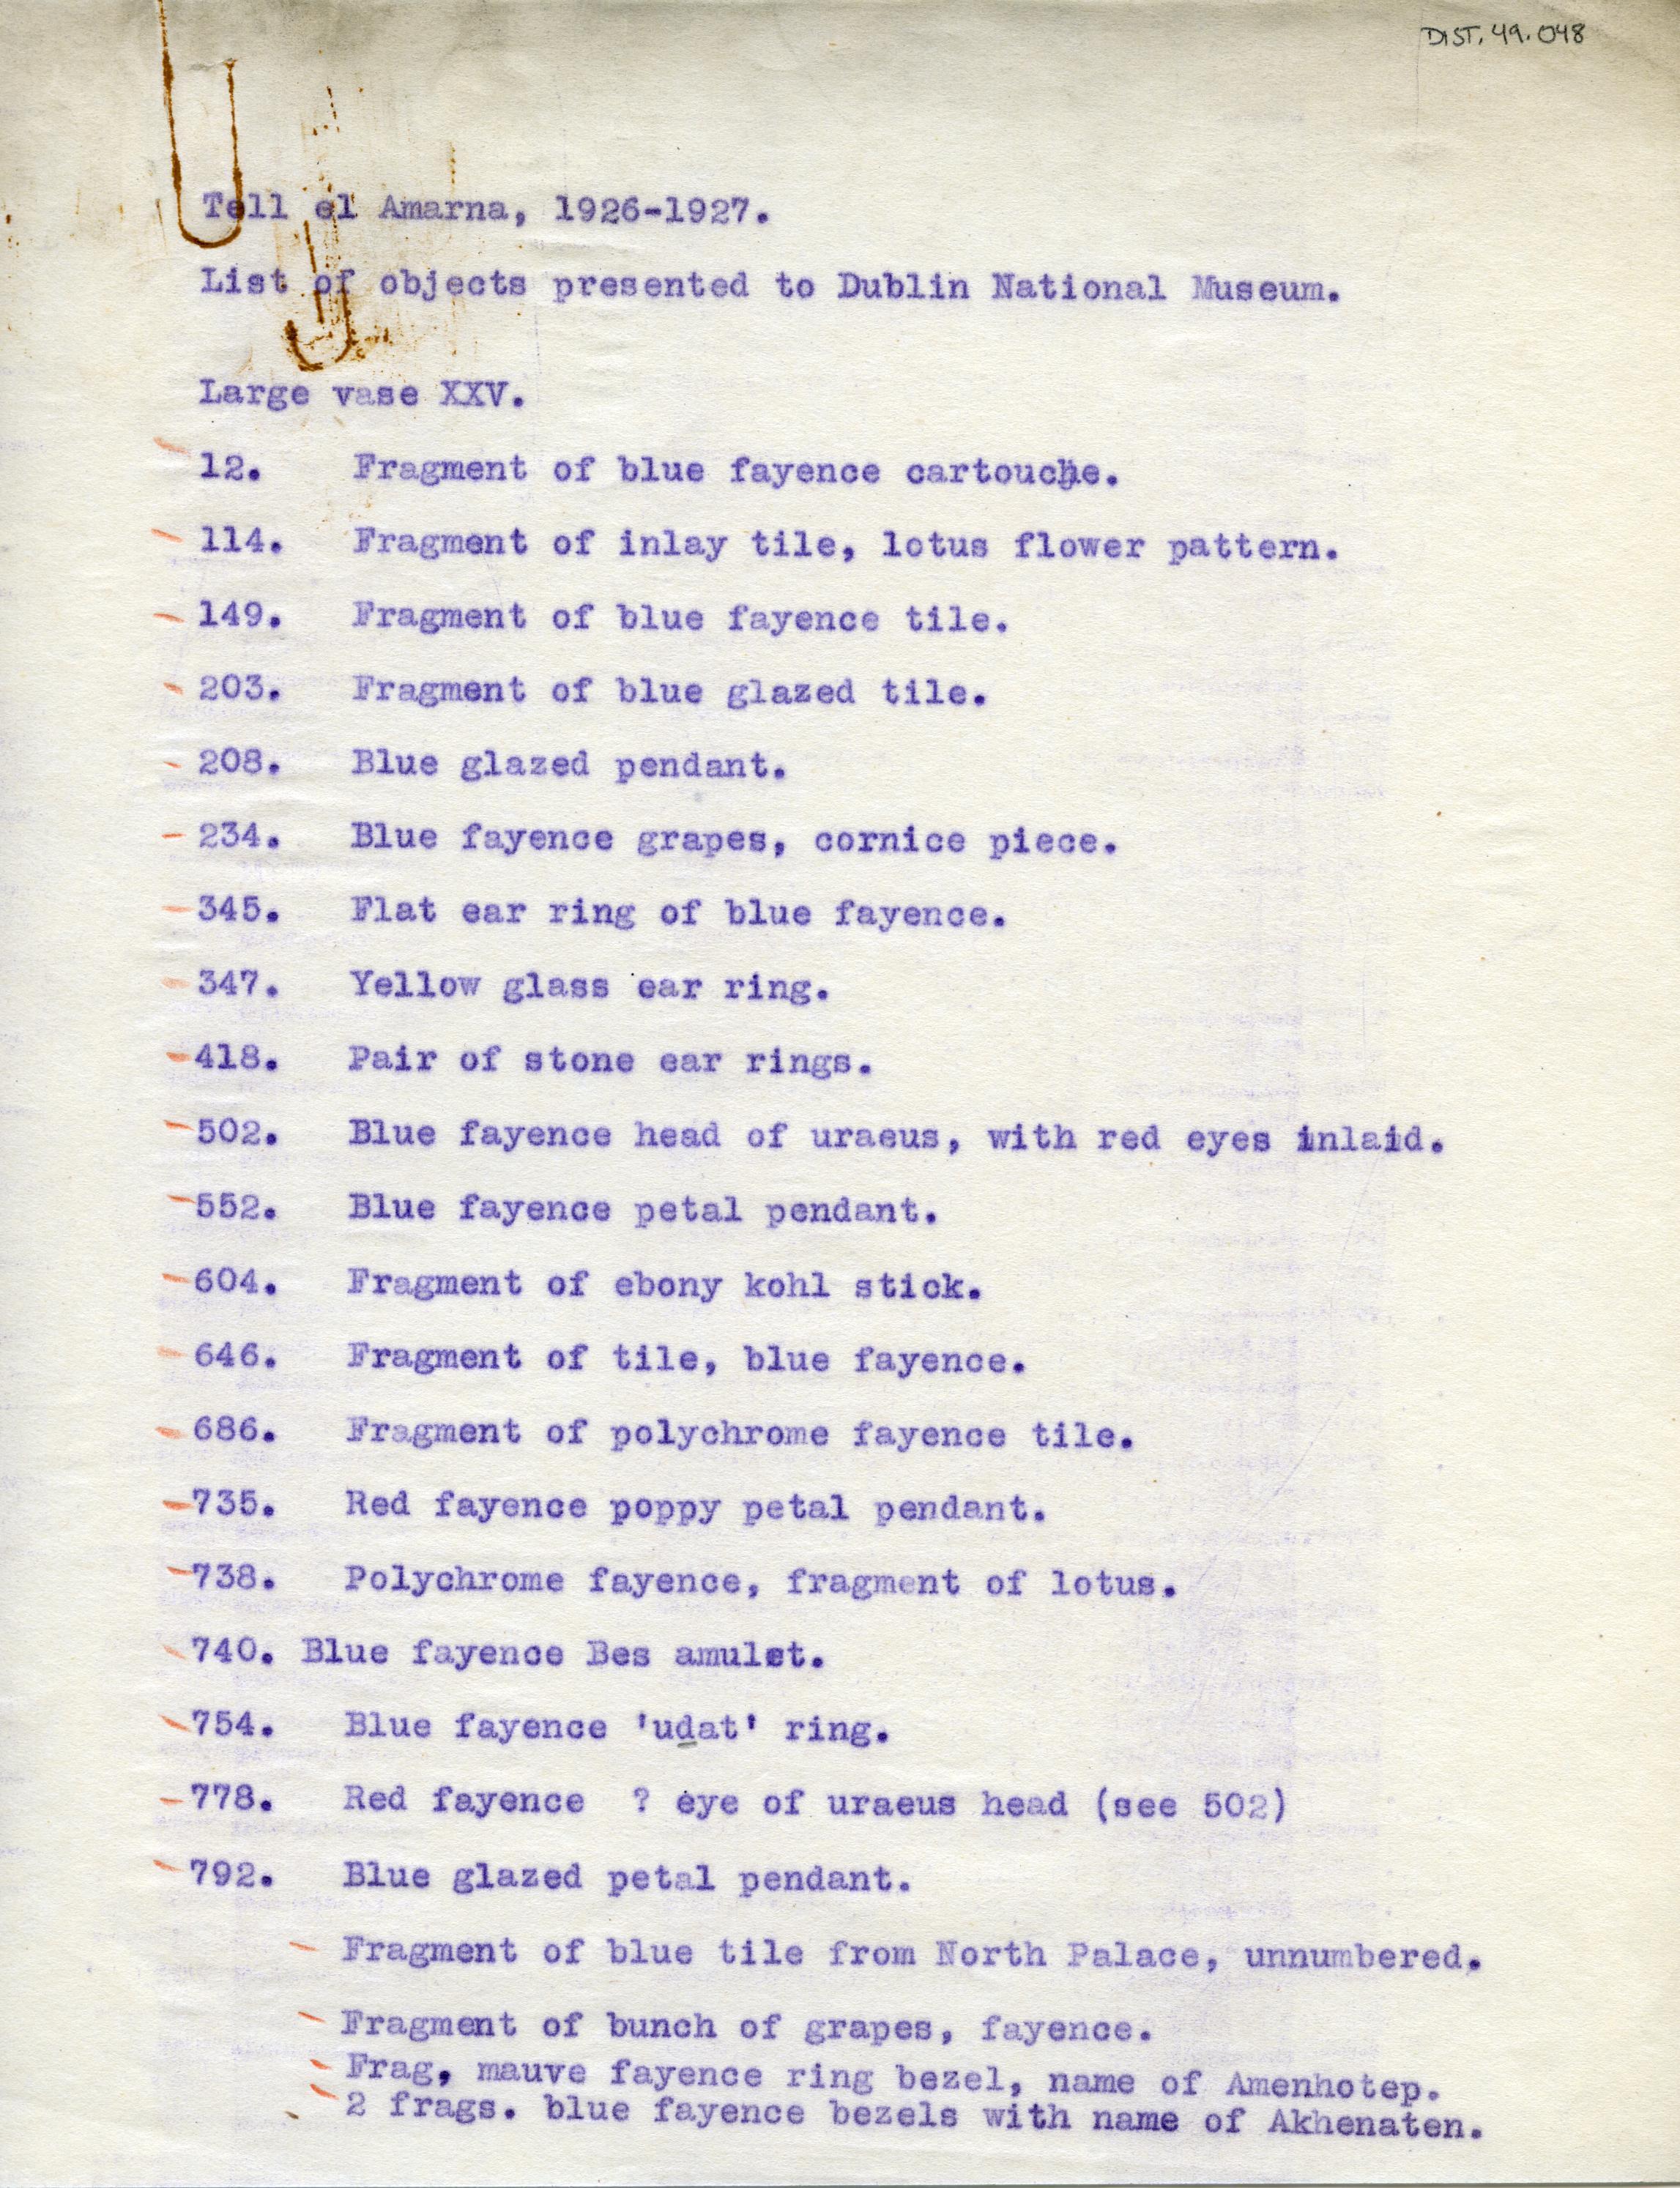 1926-27 el-Amarna DIST.49.048